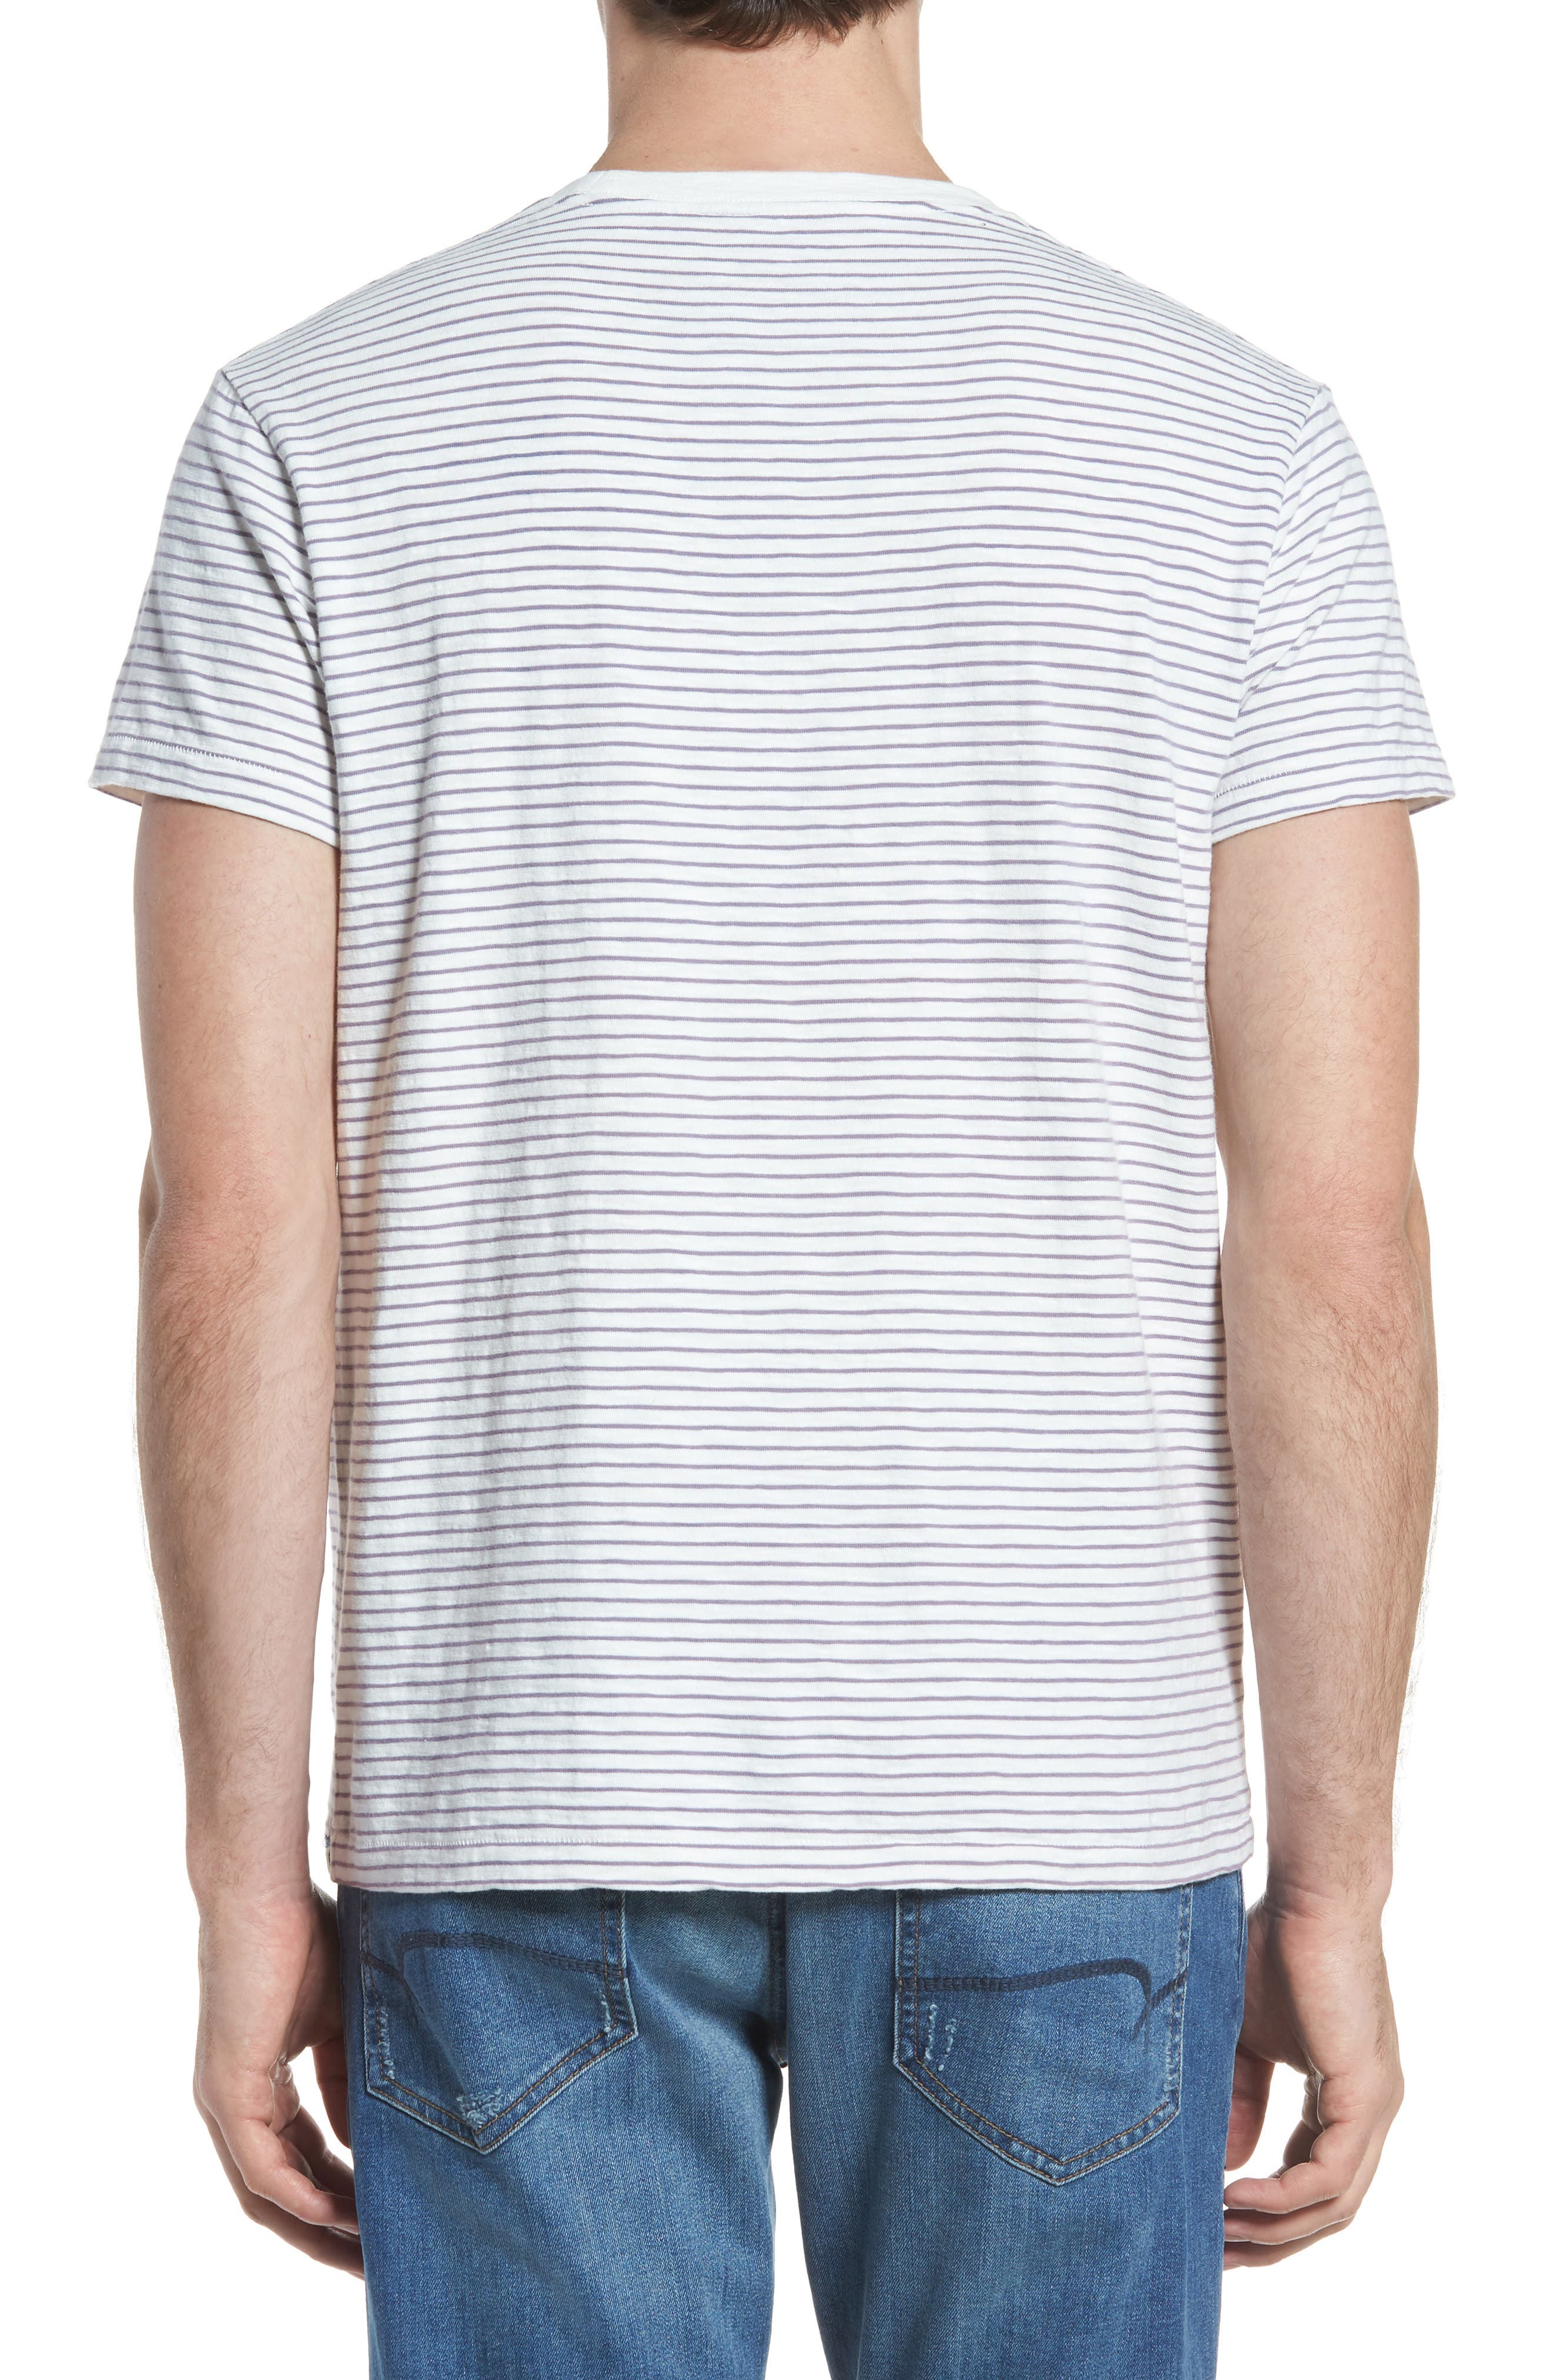 Malaga Cove Stripe T-Shirt,                             Alternate thumbnail 2, color,                             Antique White